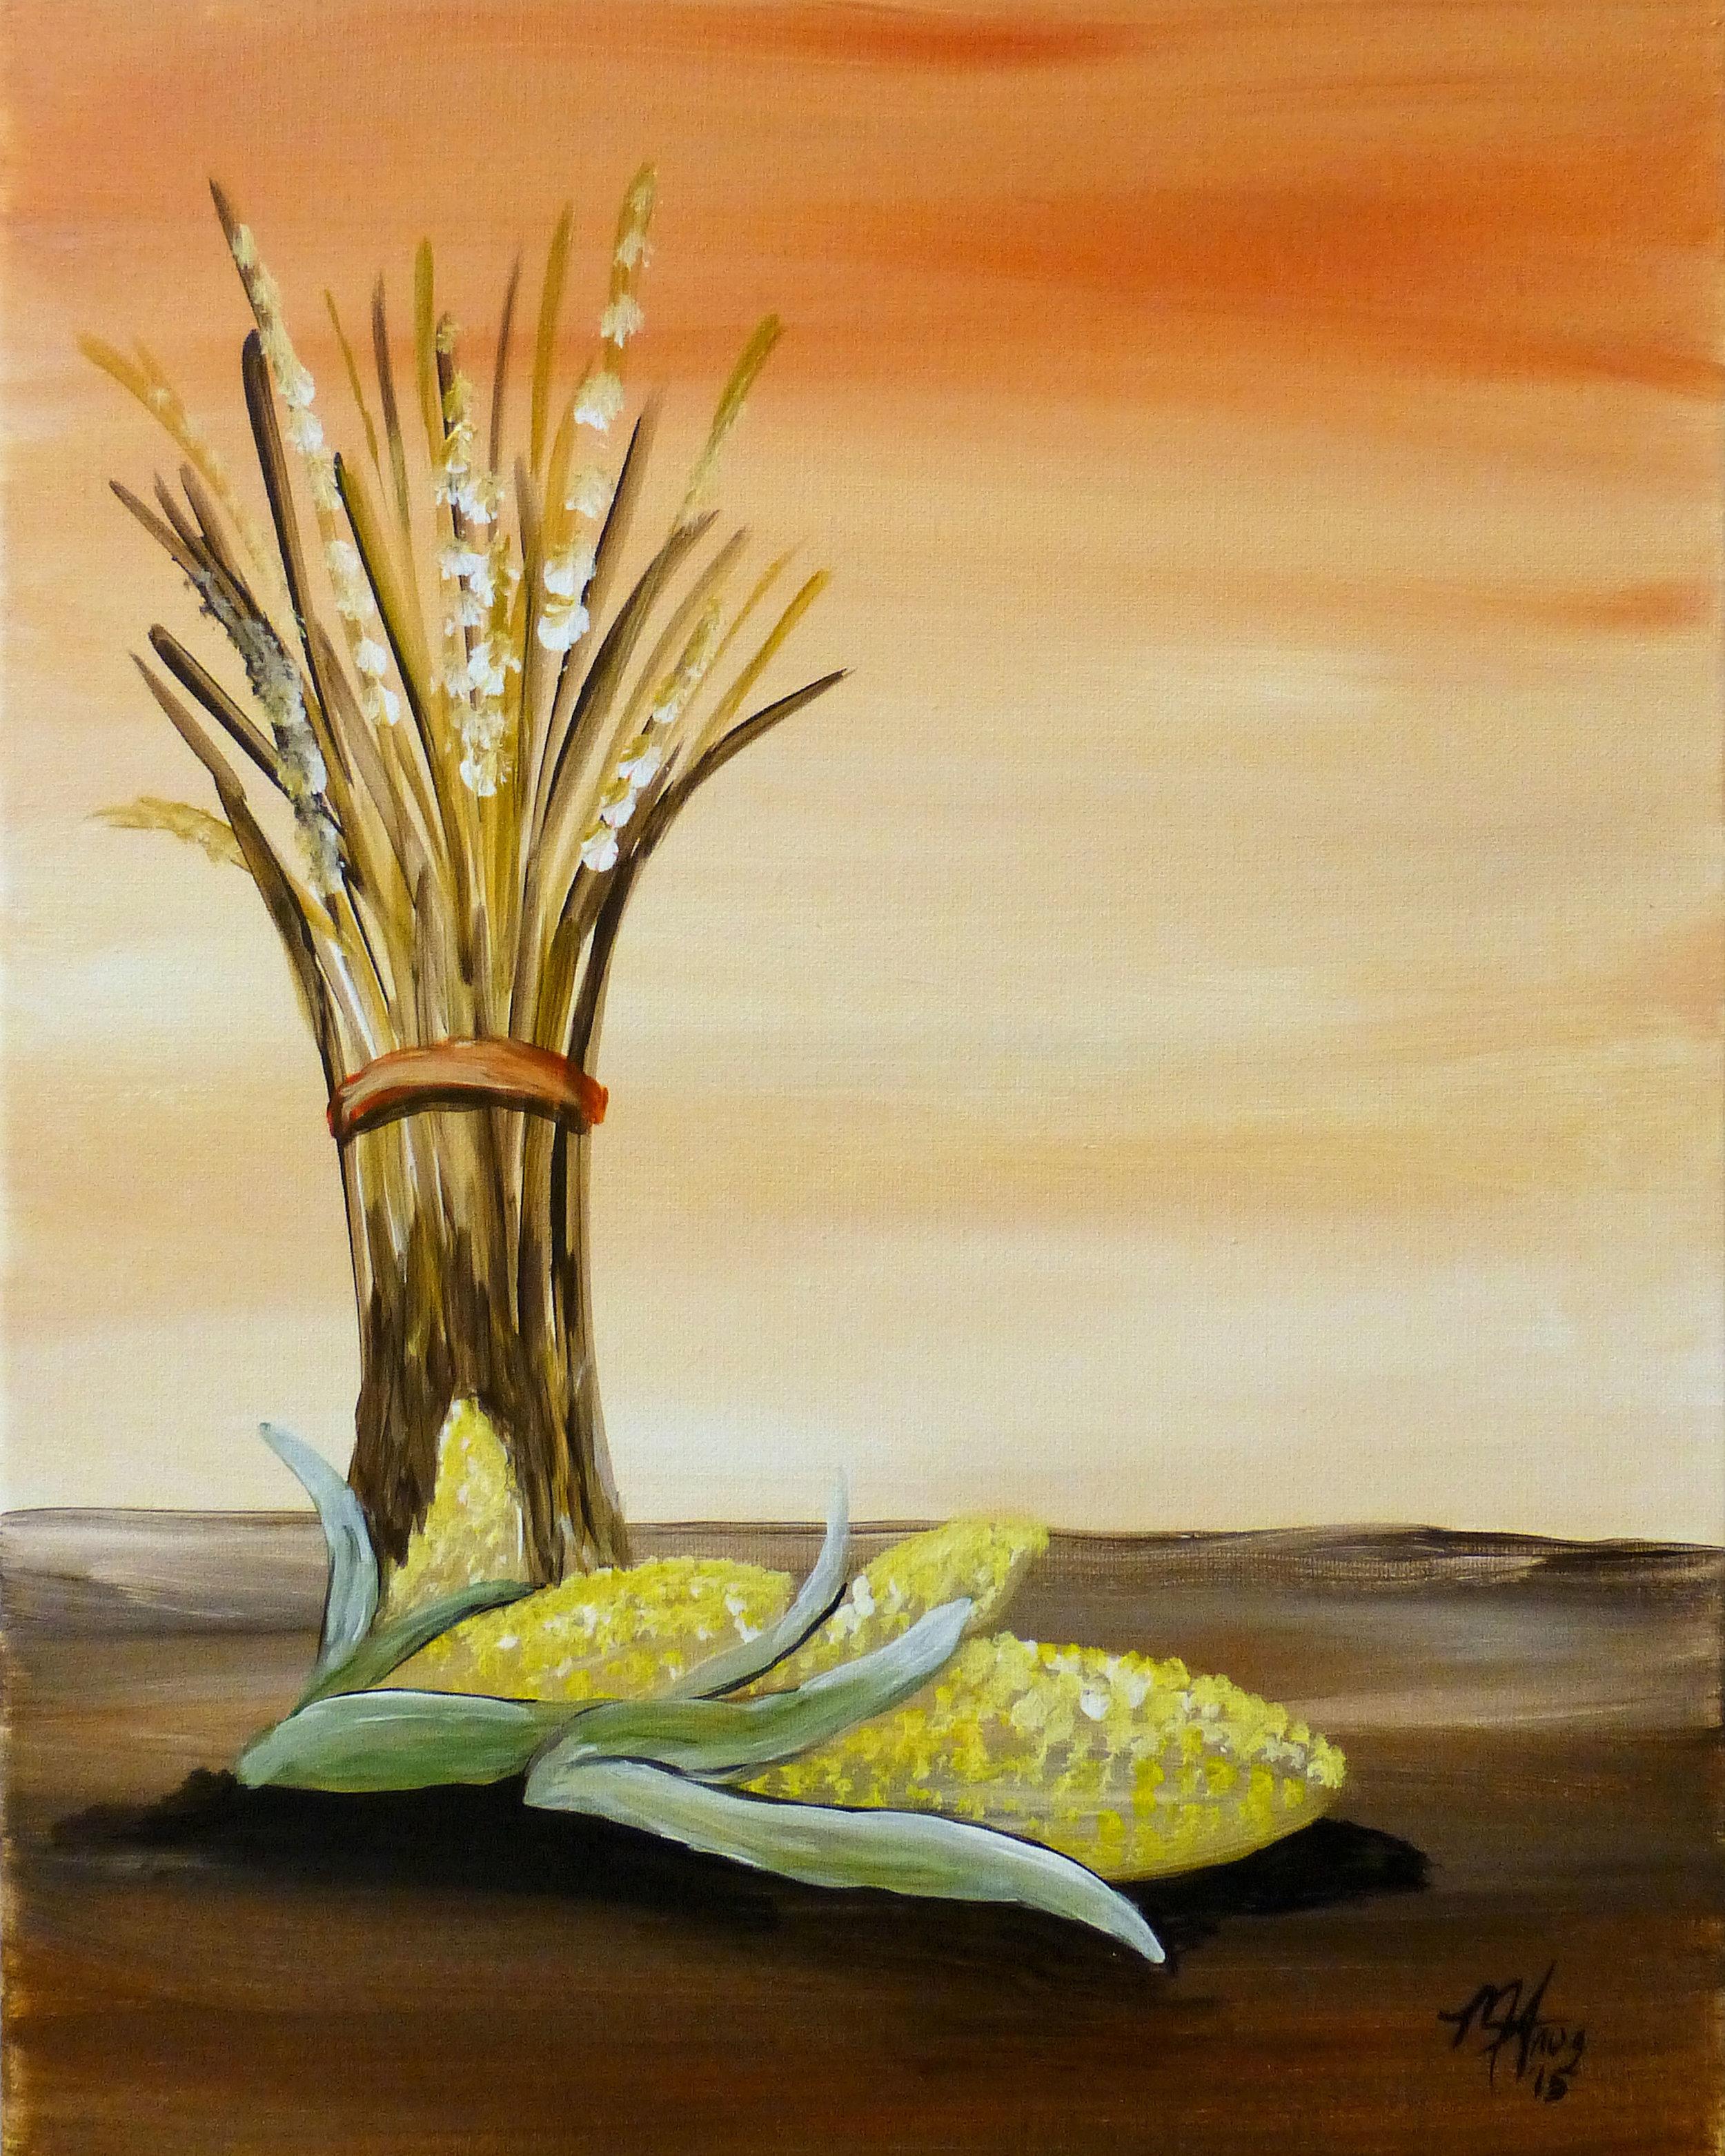 Corn Stalk